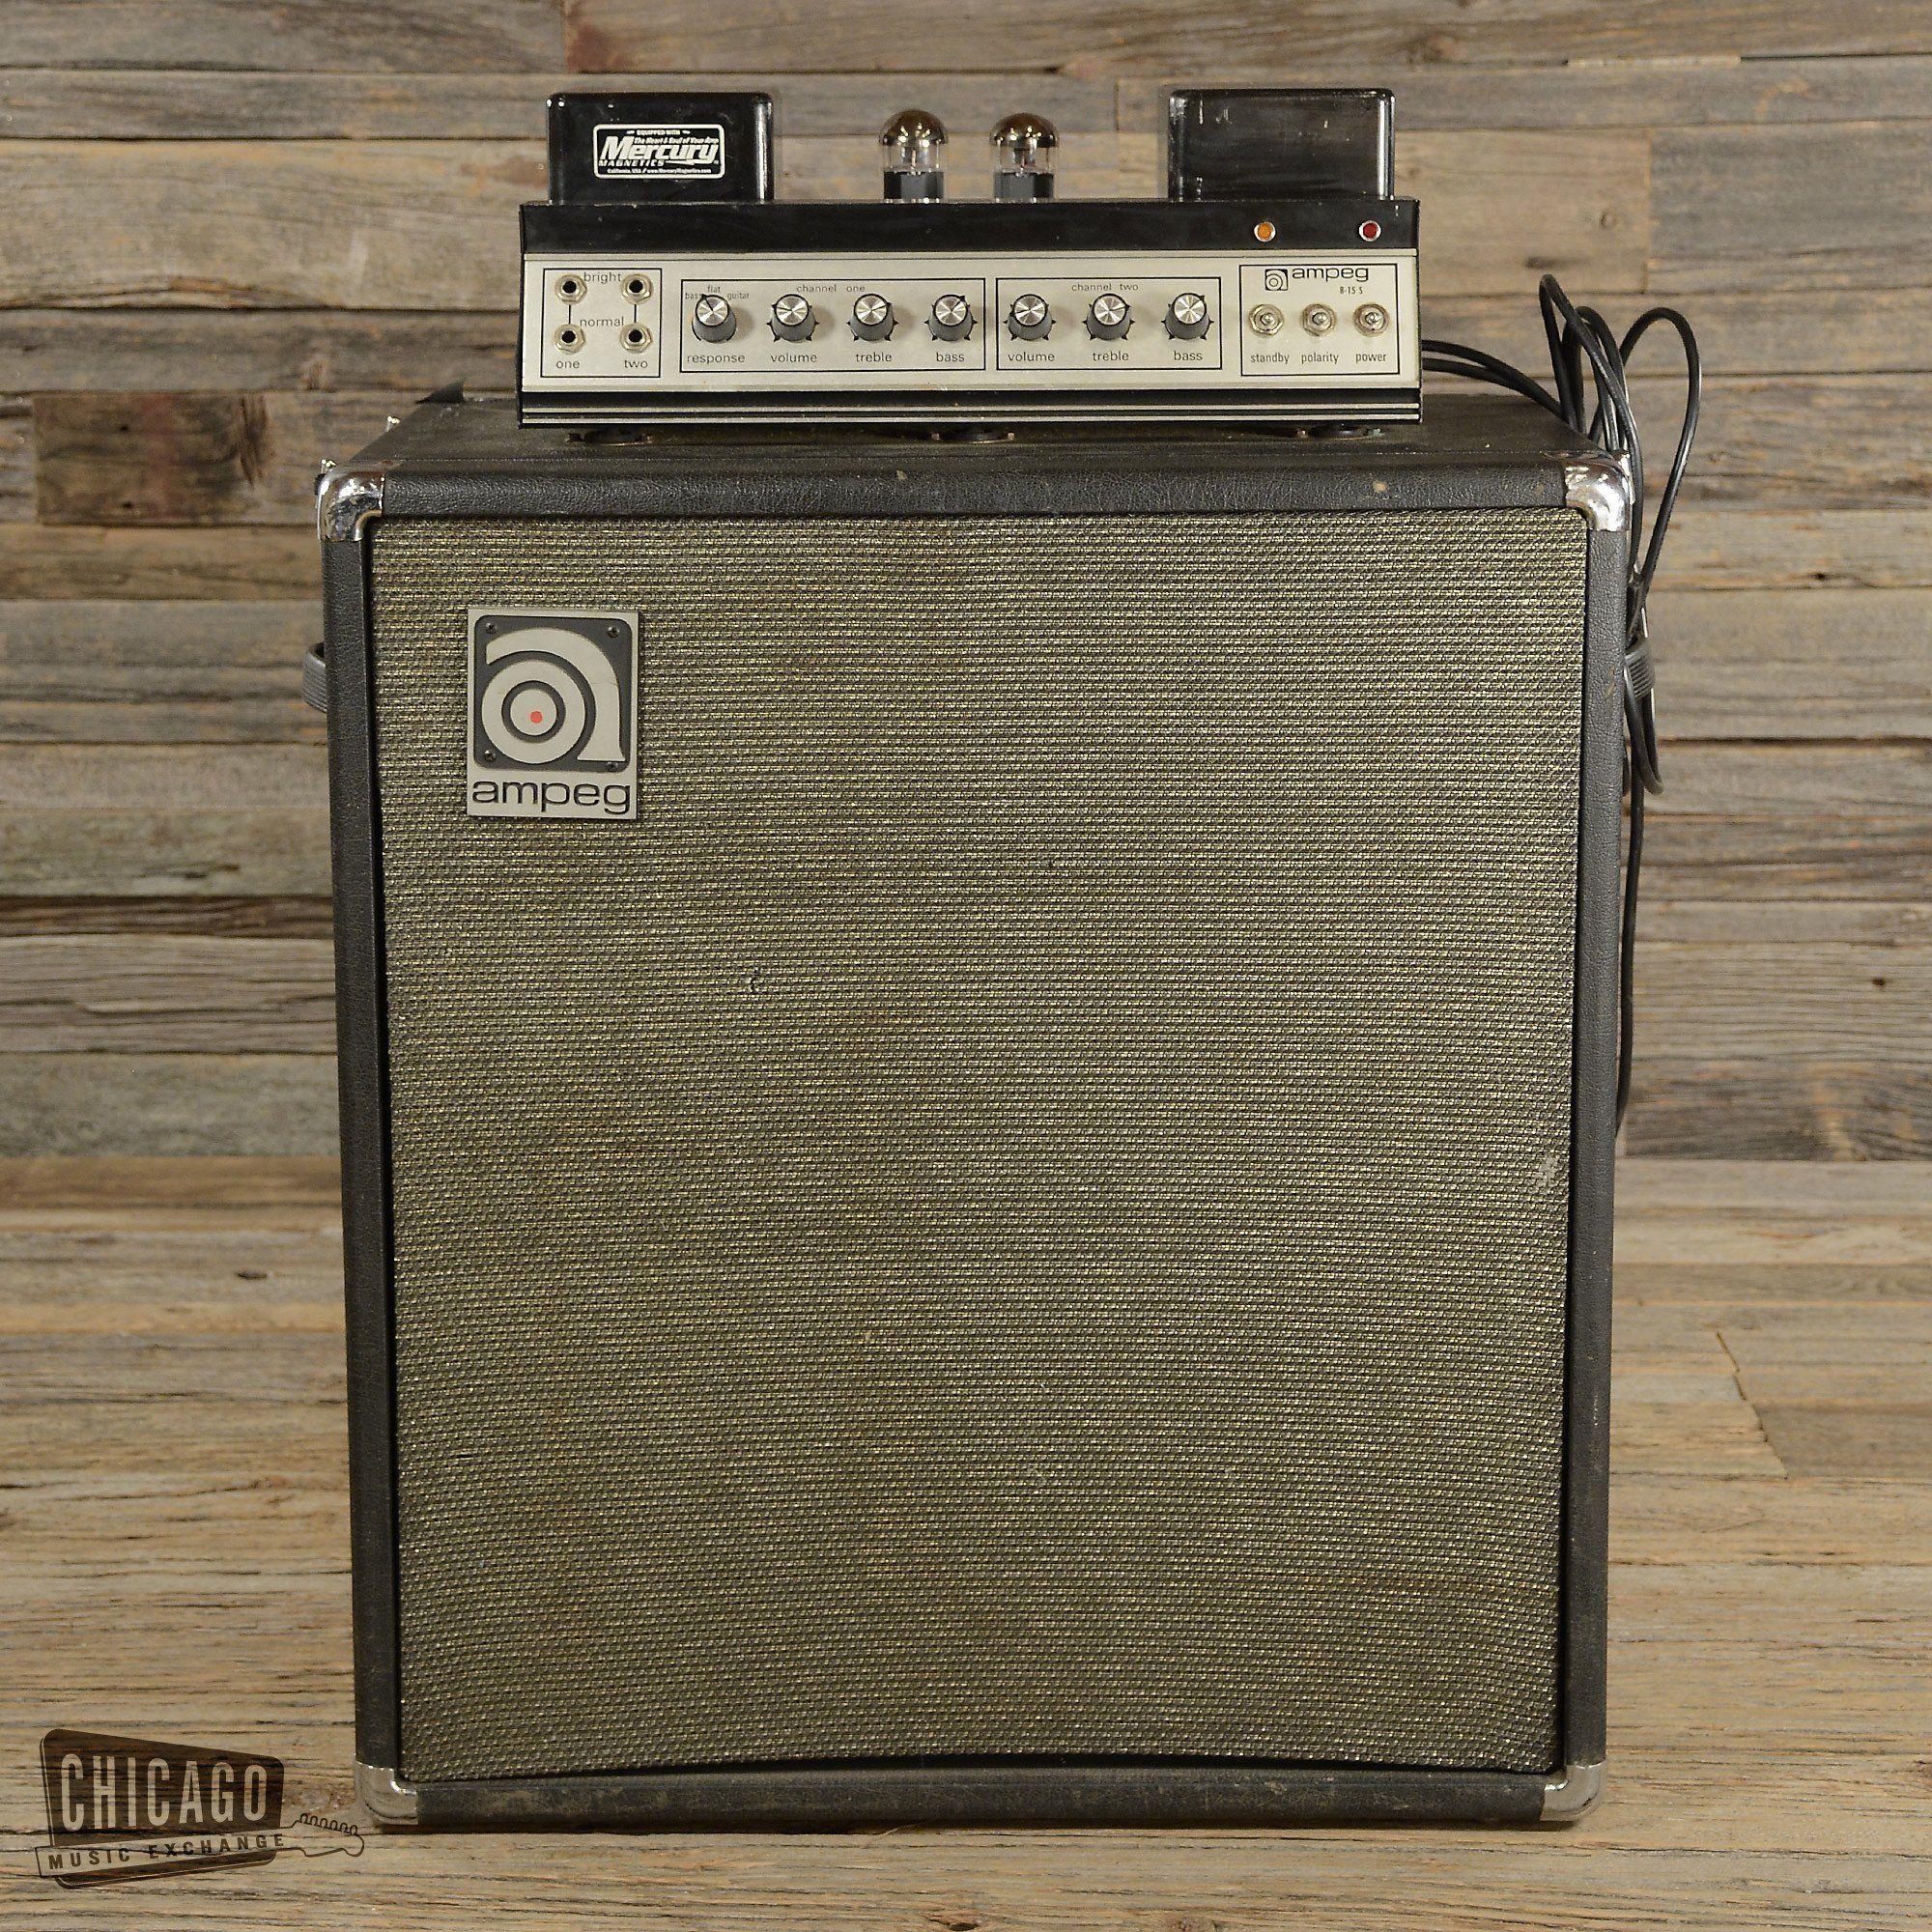 Amp vintage b15 ampeg bass